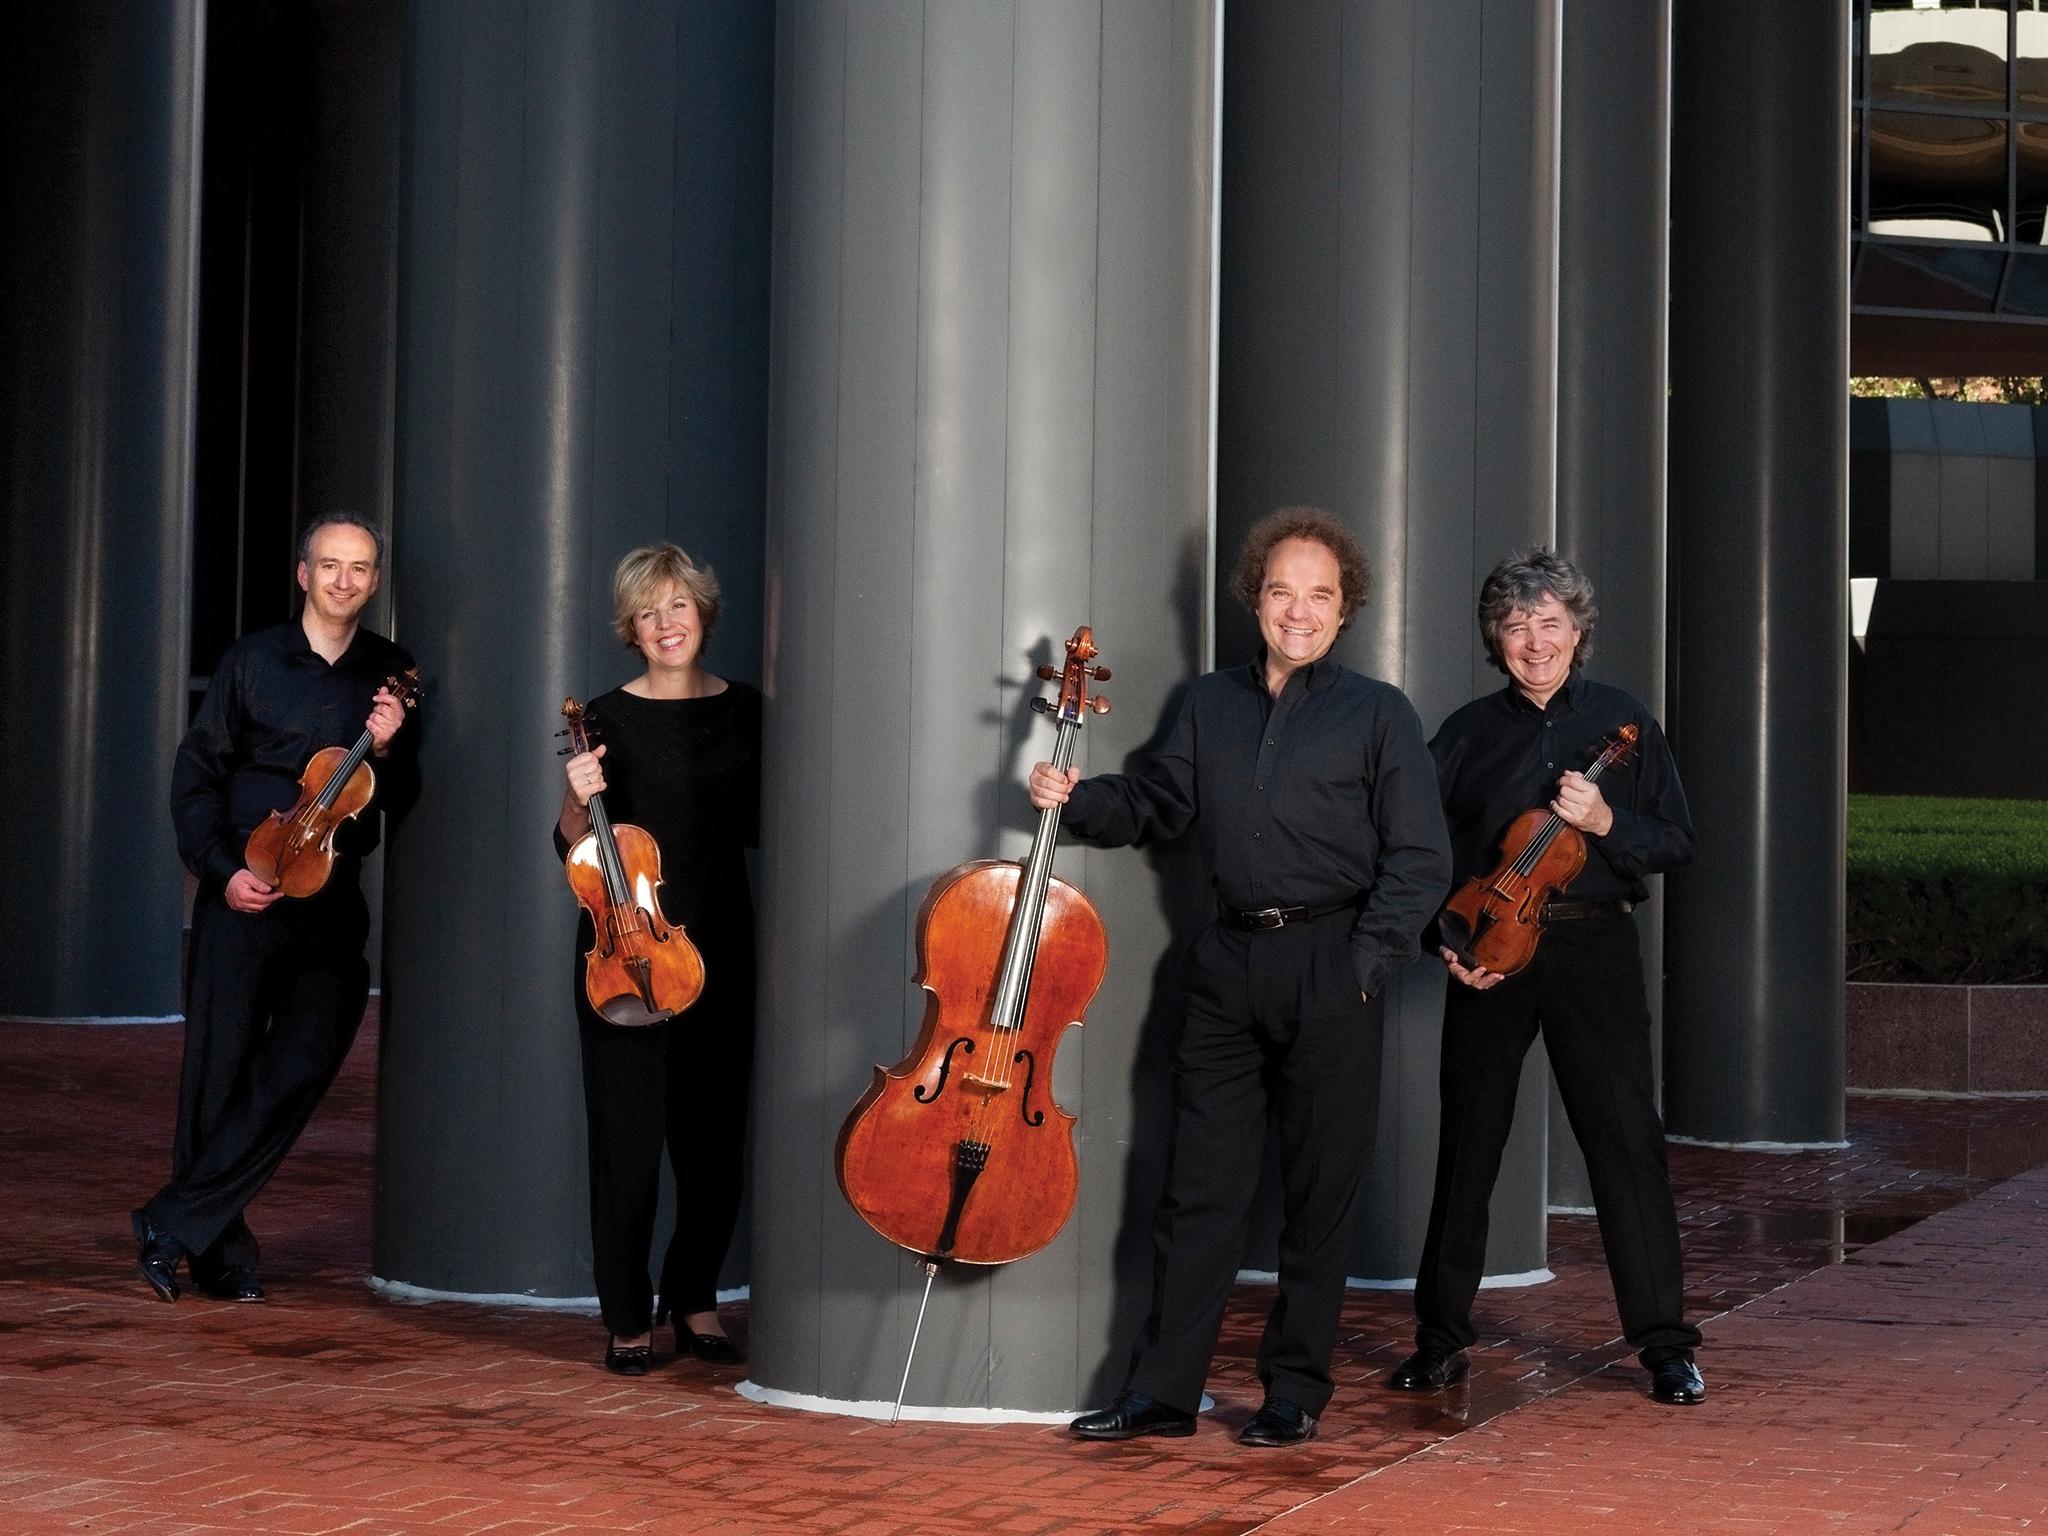 Interview: Edward Dusinberre on Beethoven and the Takács Quartet